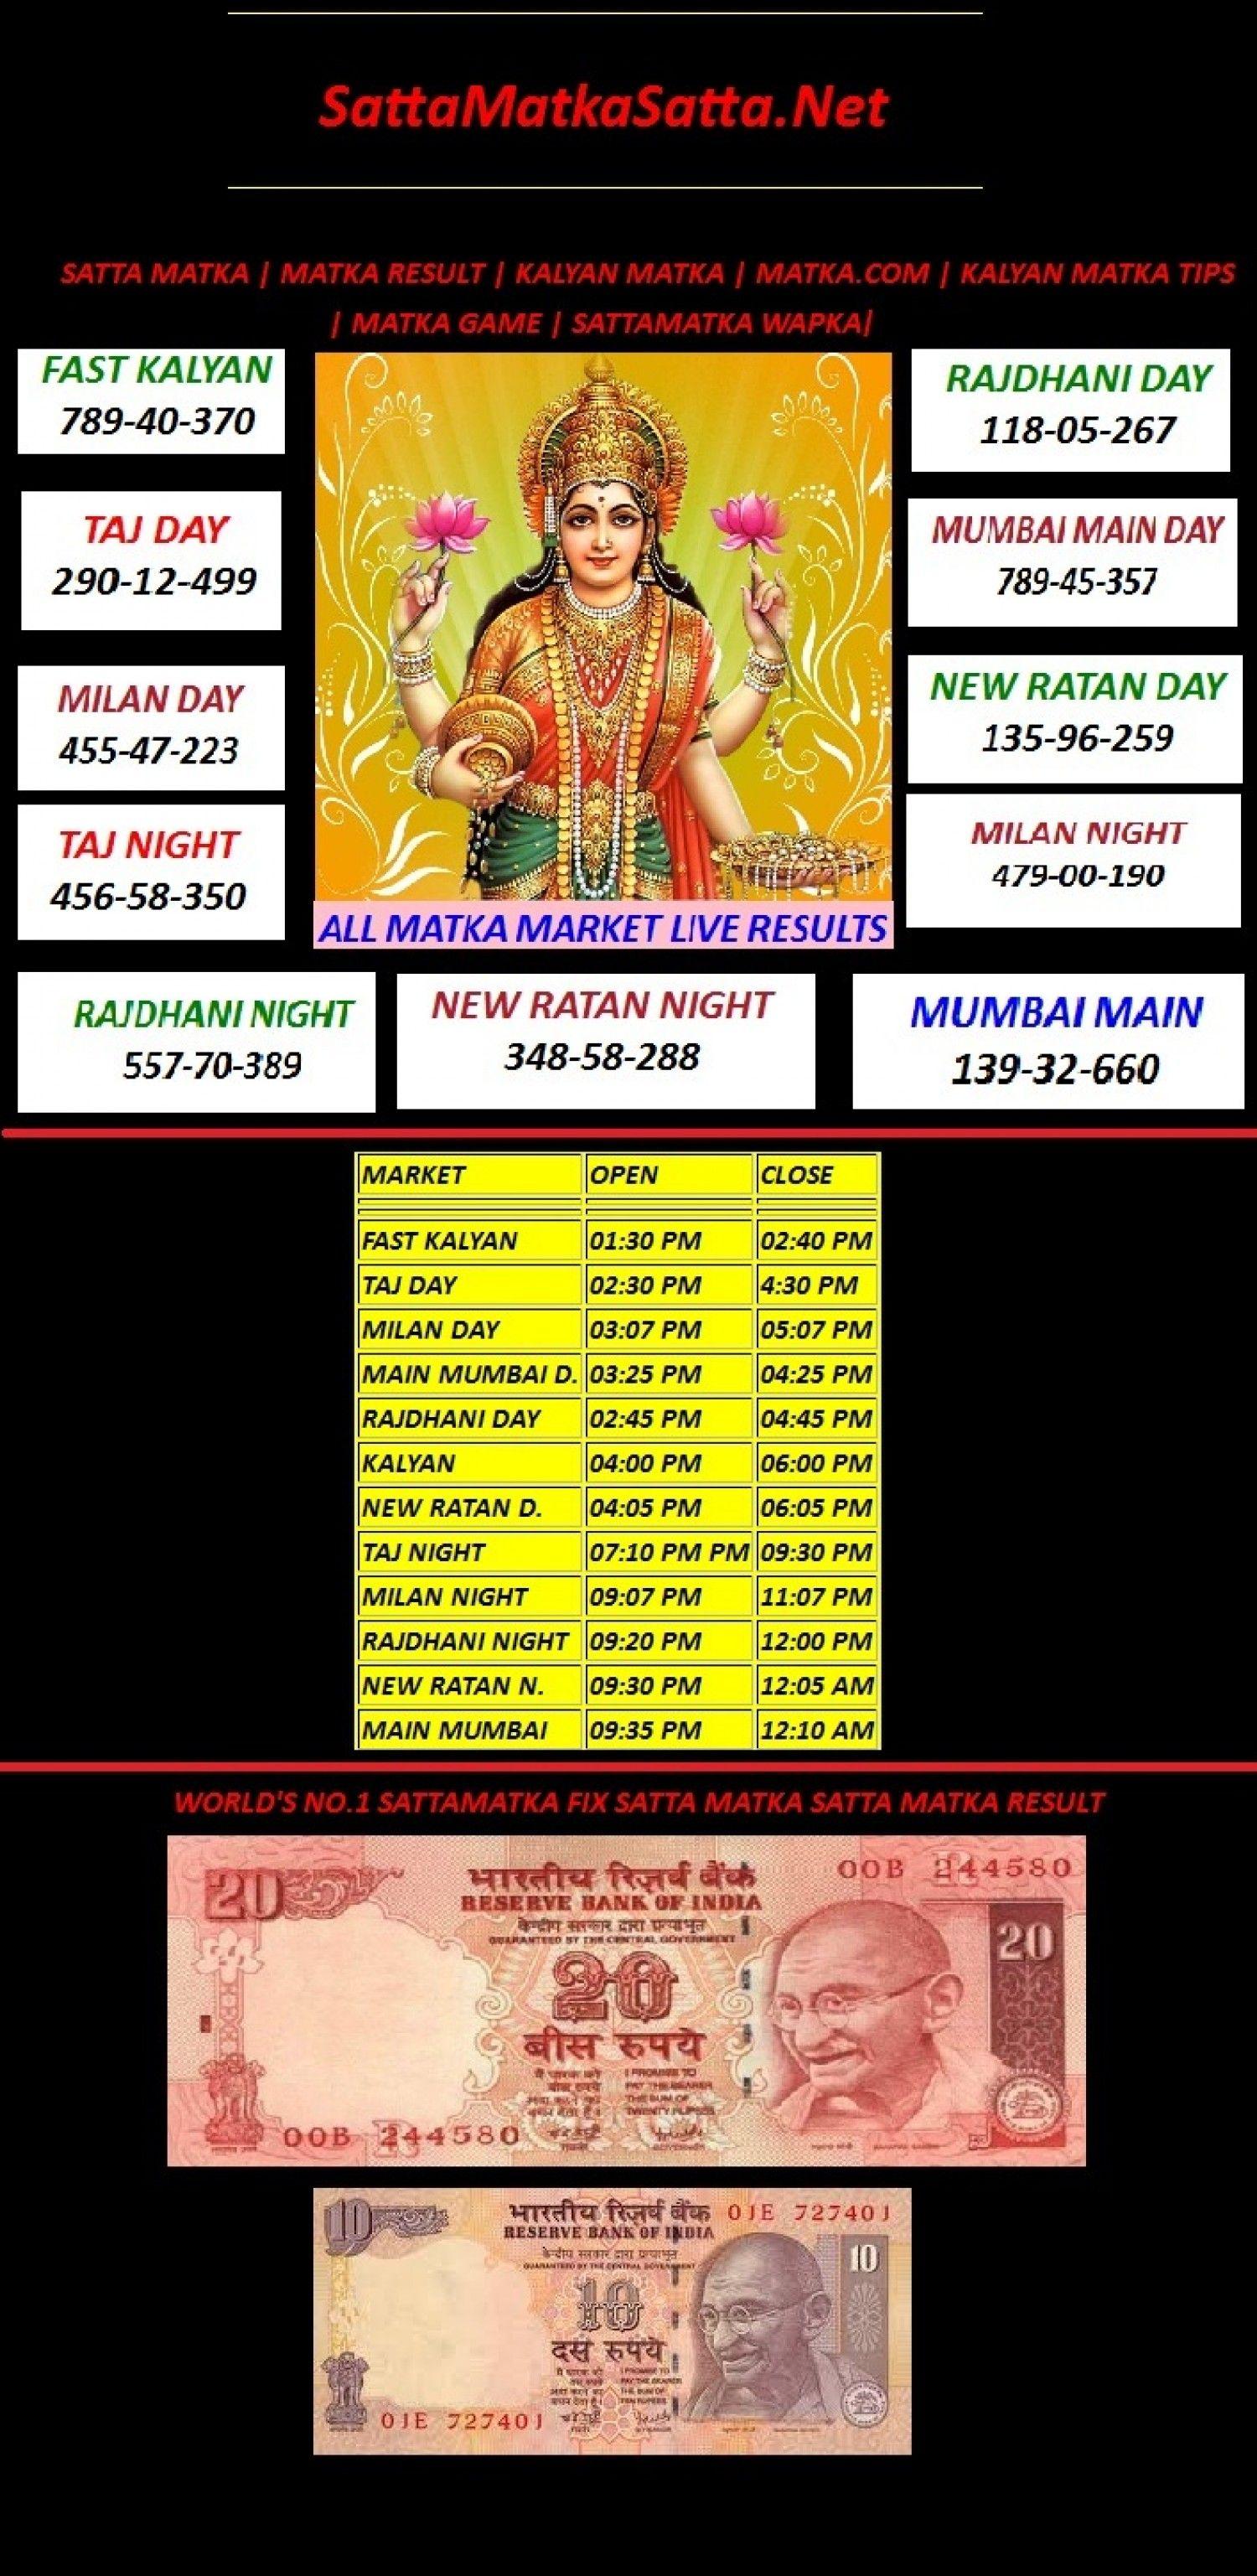 Satta Matka is the Indian market Gambling Entertainment